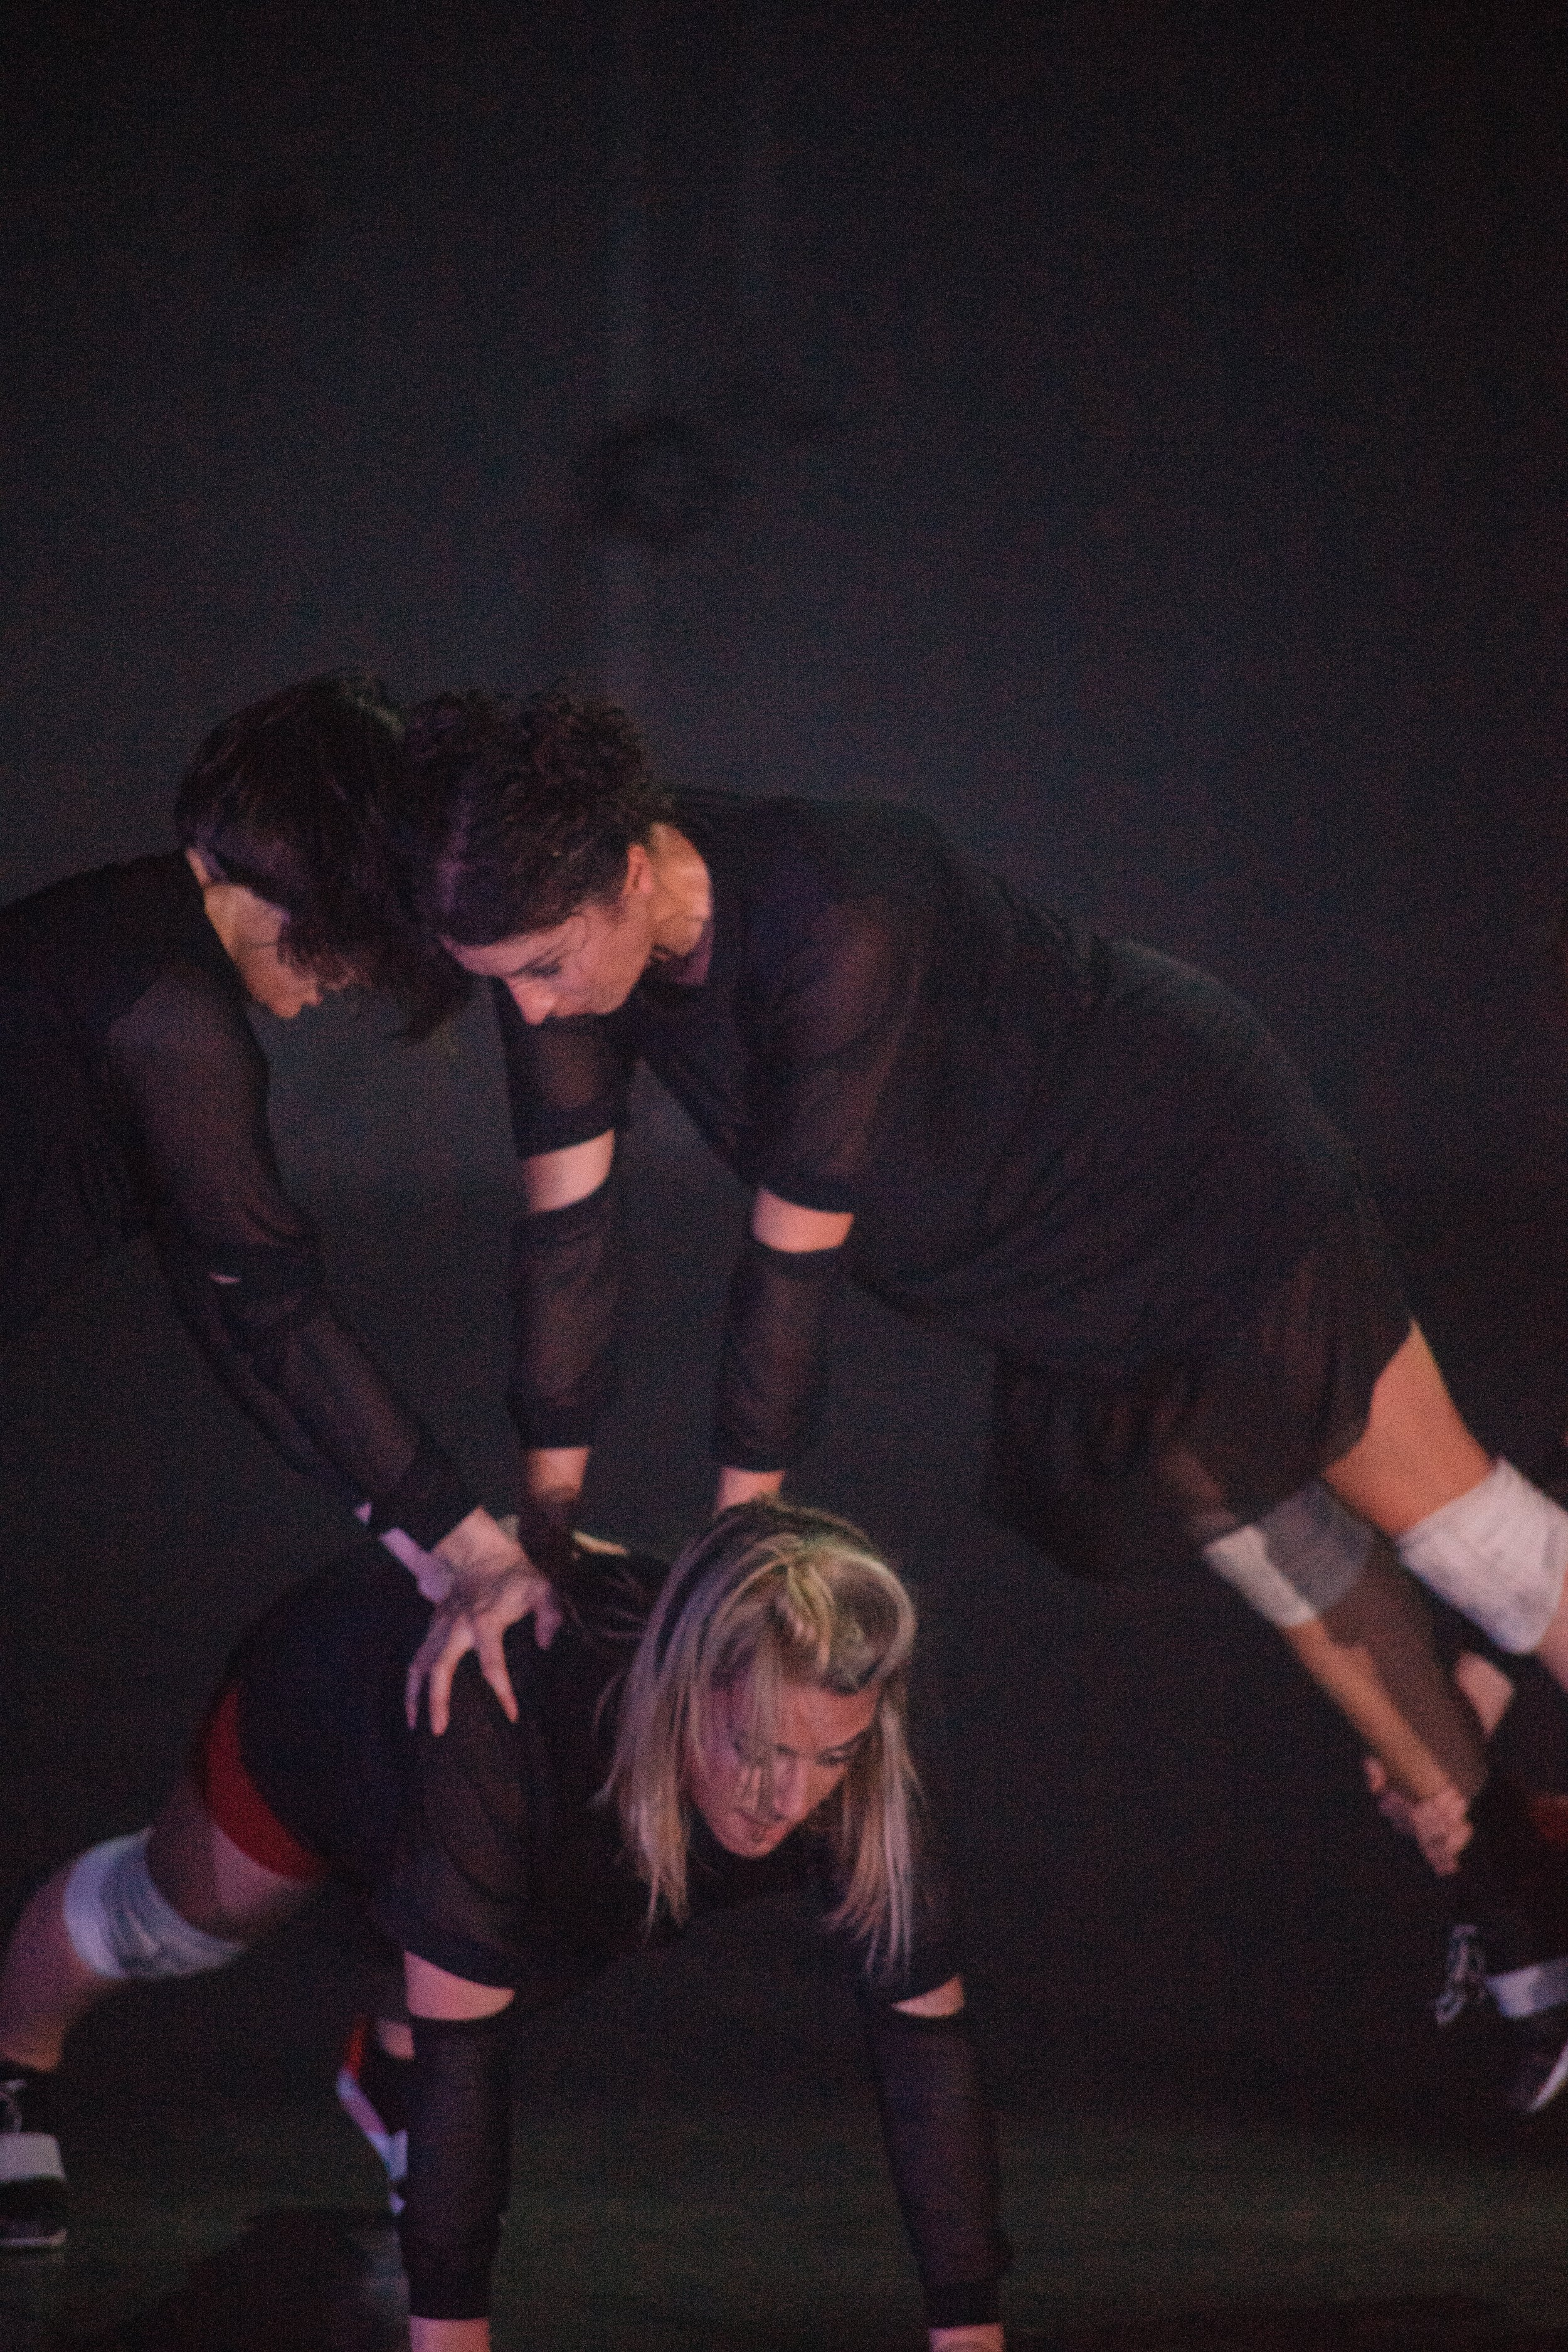 Dancers: Taryn Lavery, Alex Miller, Sarah Navarrete